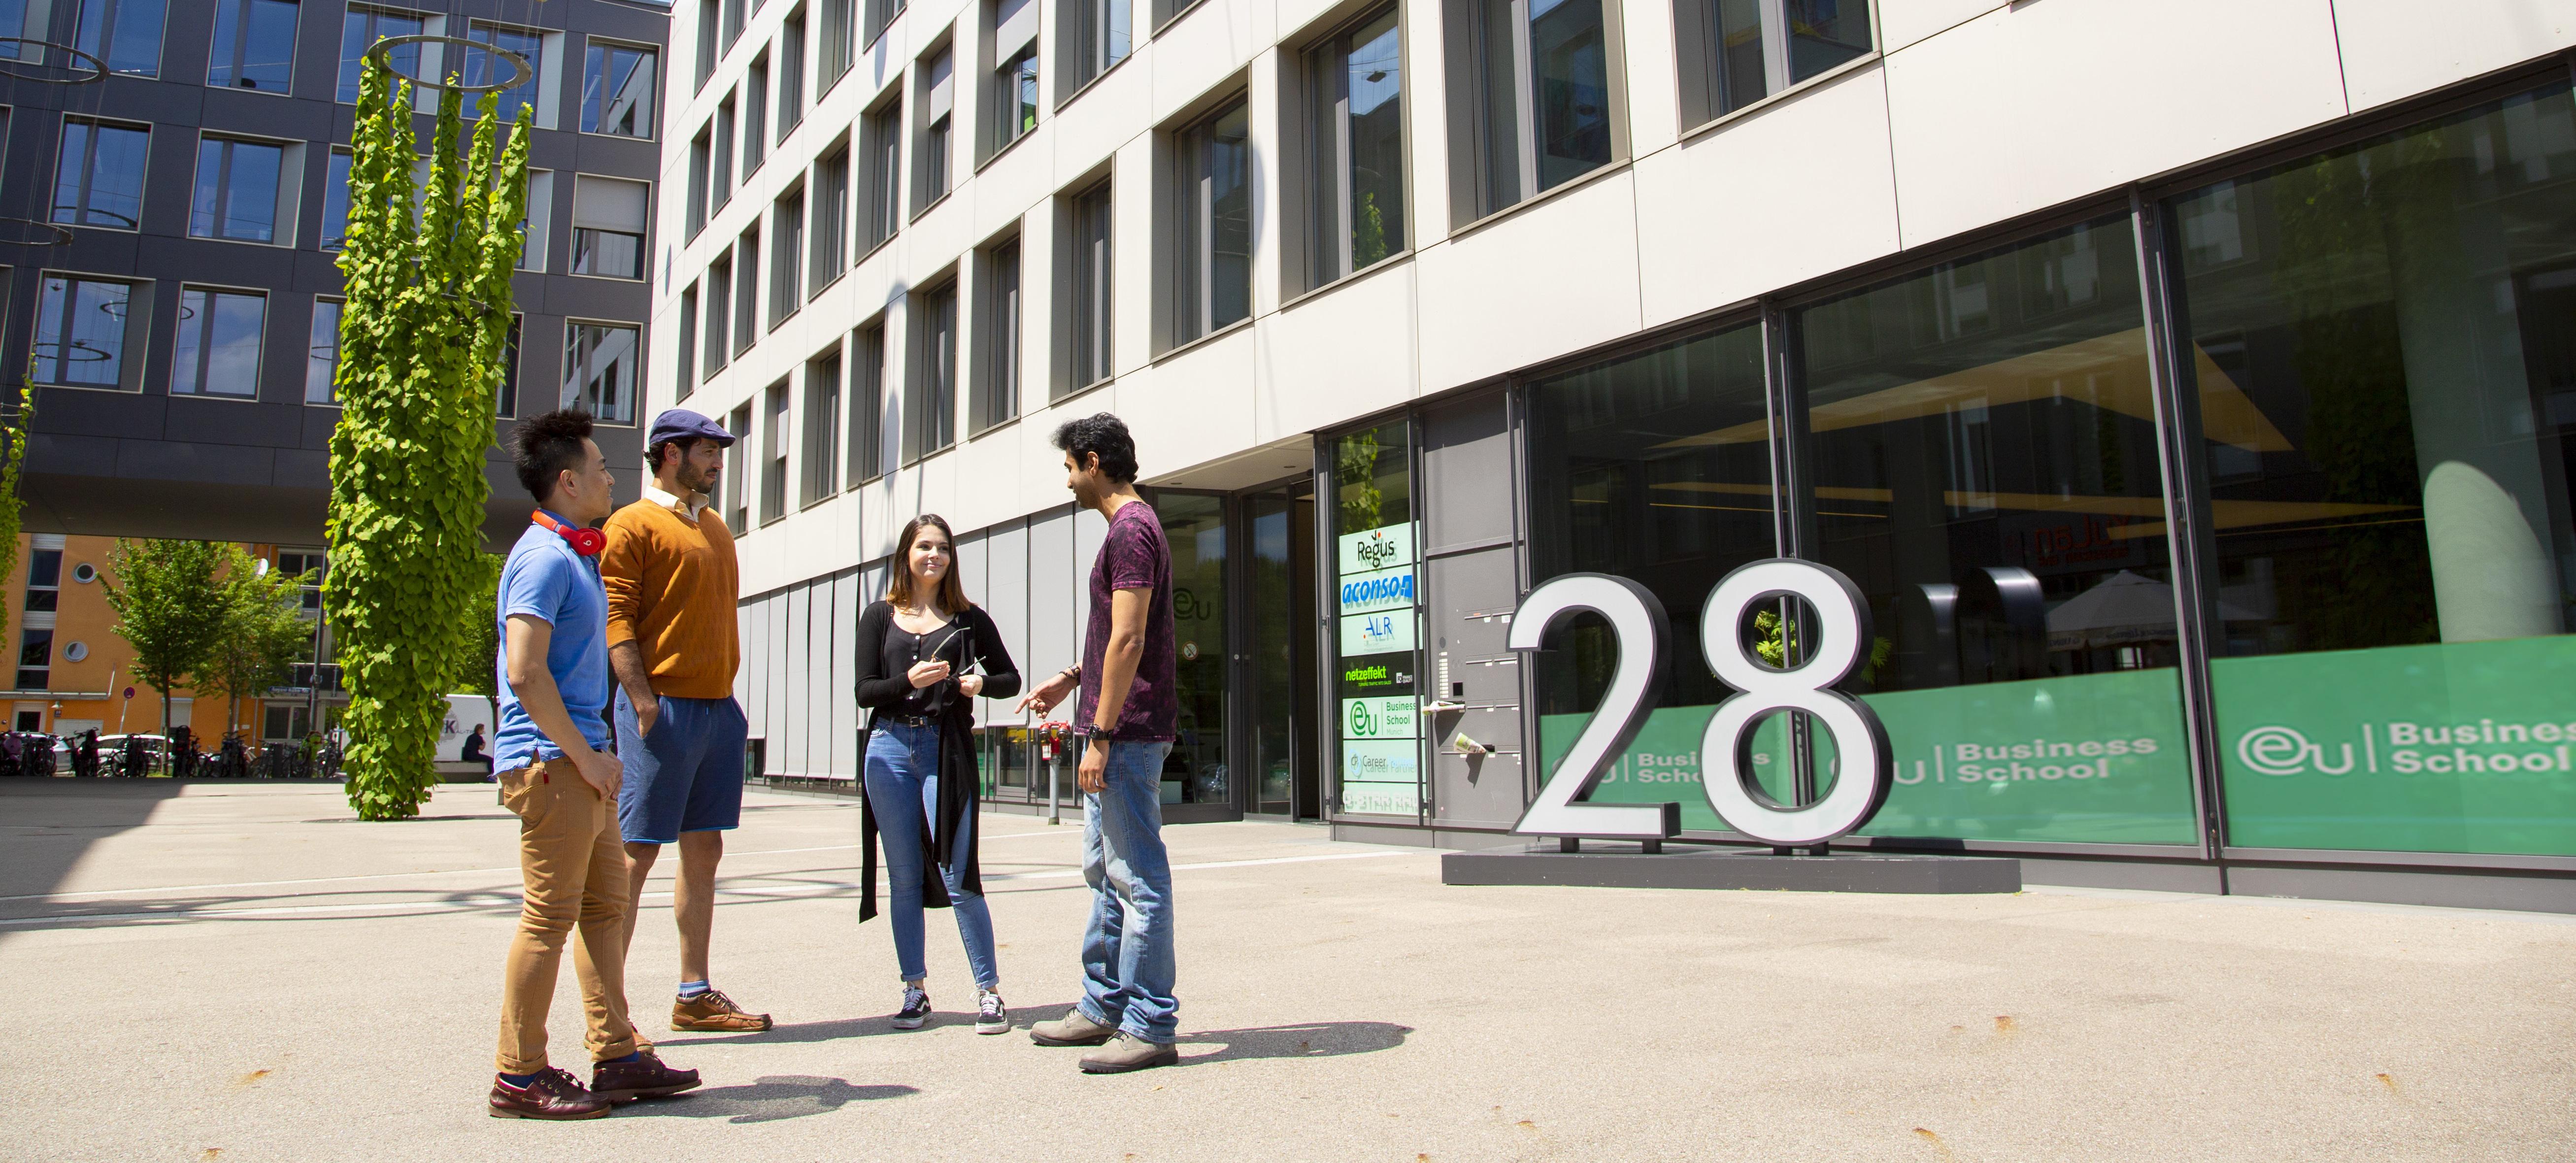 EU Business School: Winter Business School